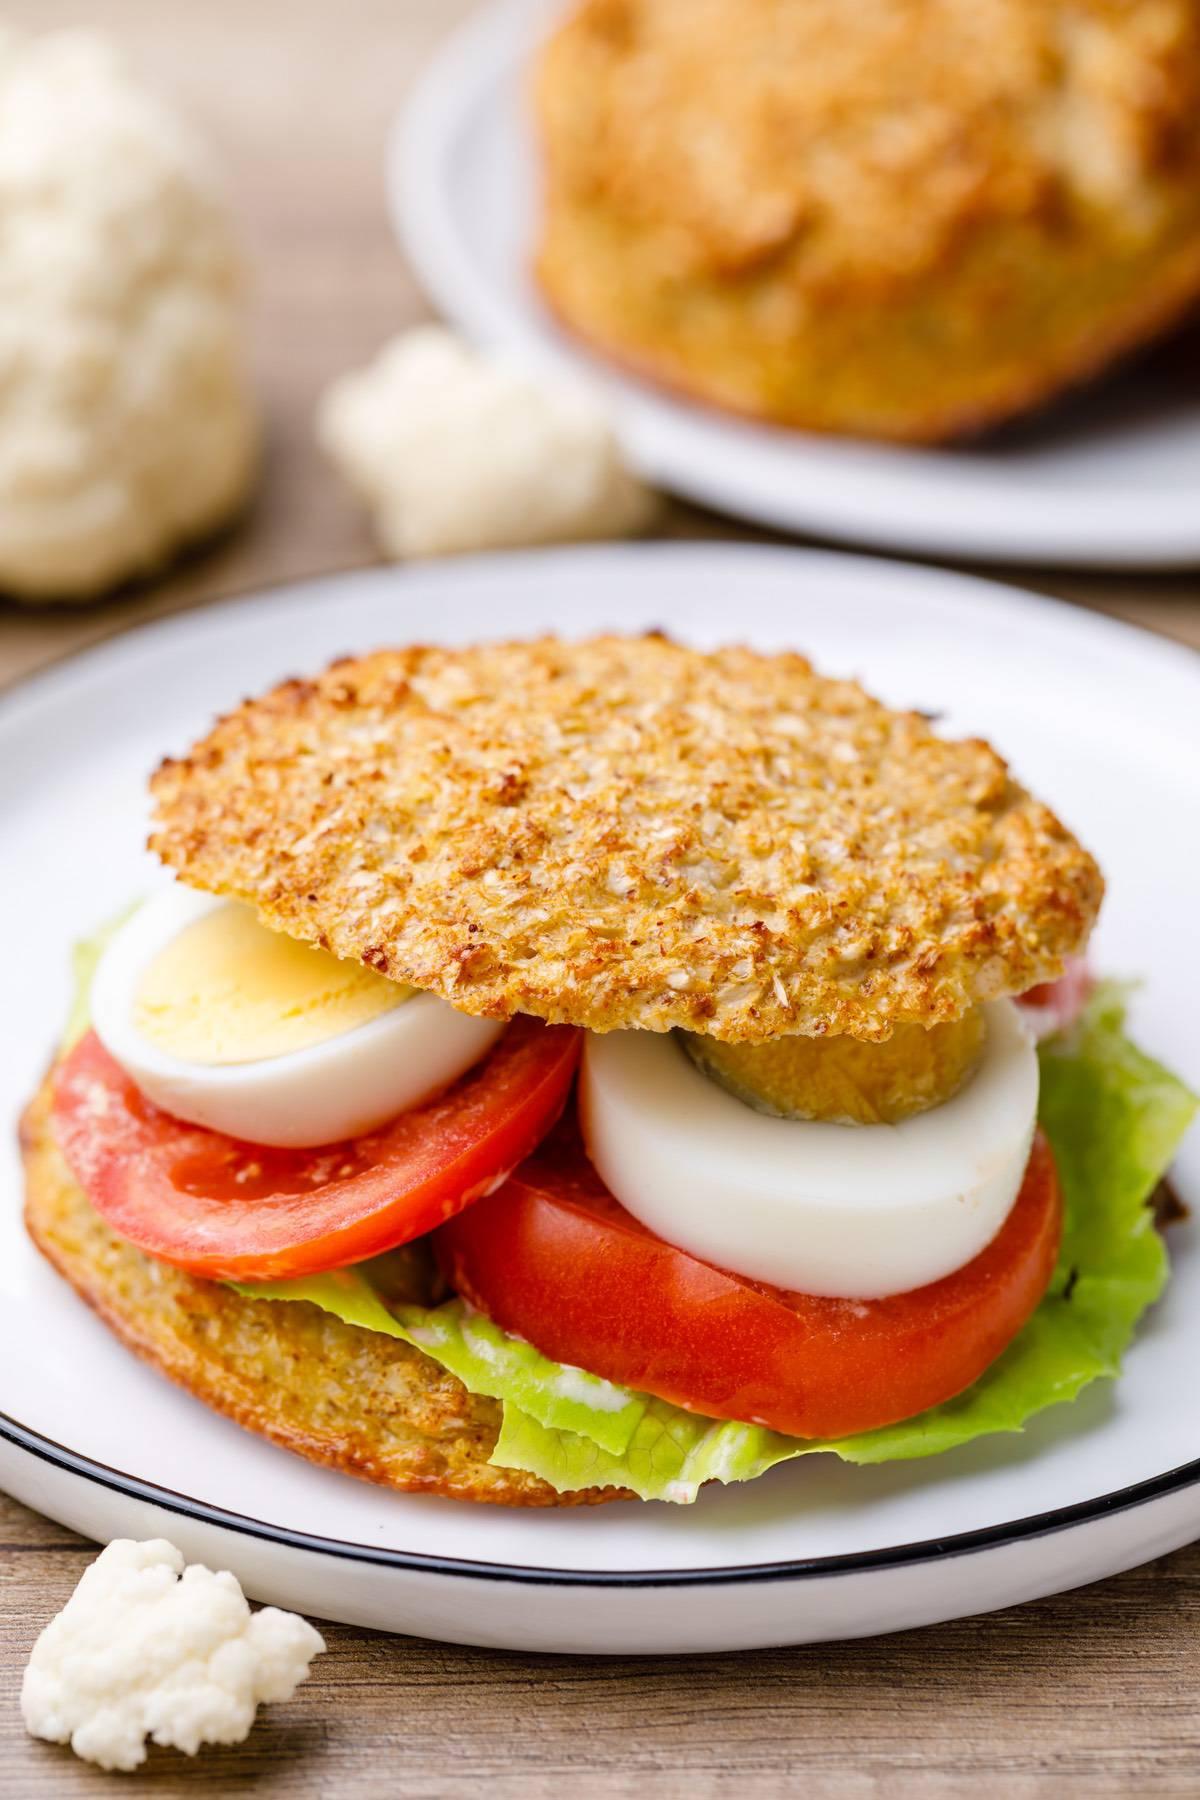 Home.fit cauliflower-bread-buns-6 Low Carb Cauliflower Bread Buns